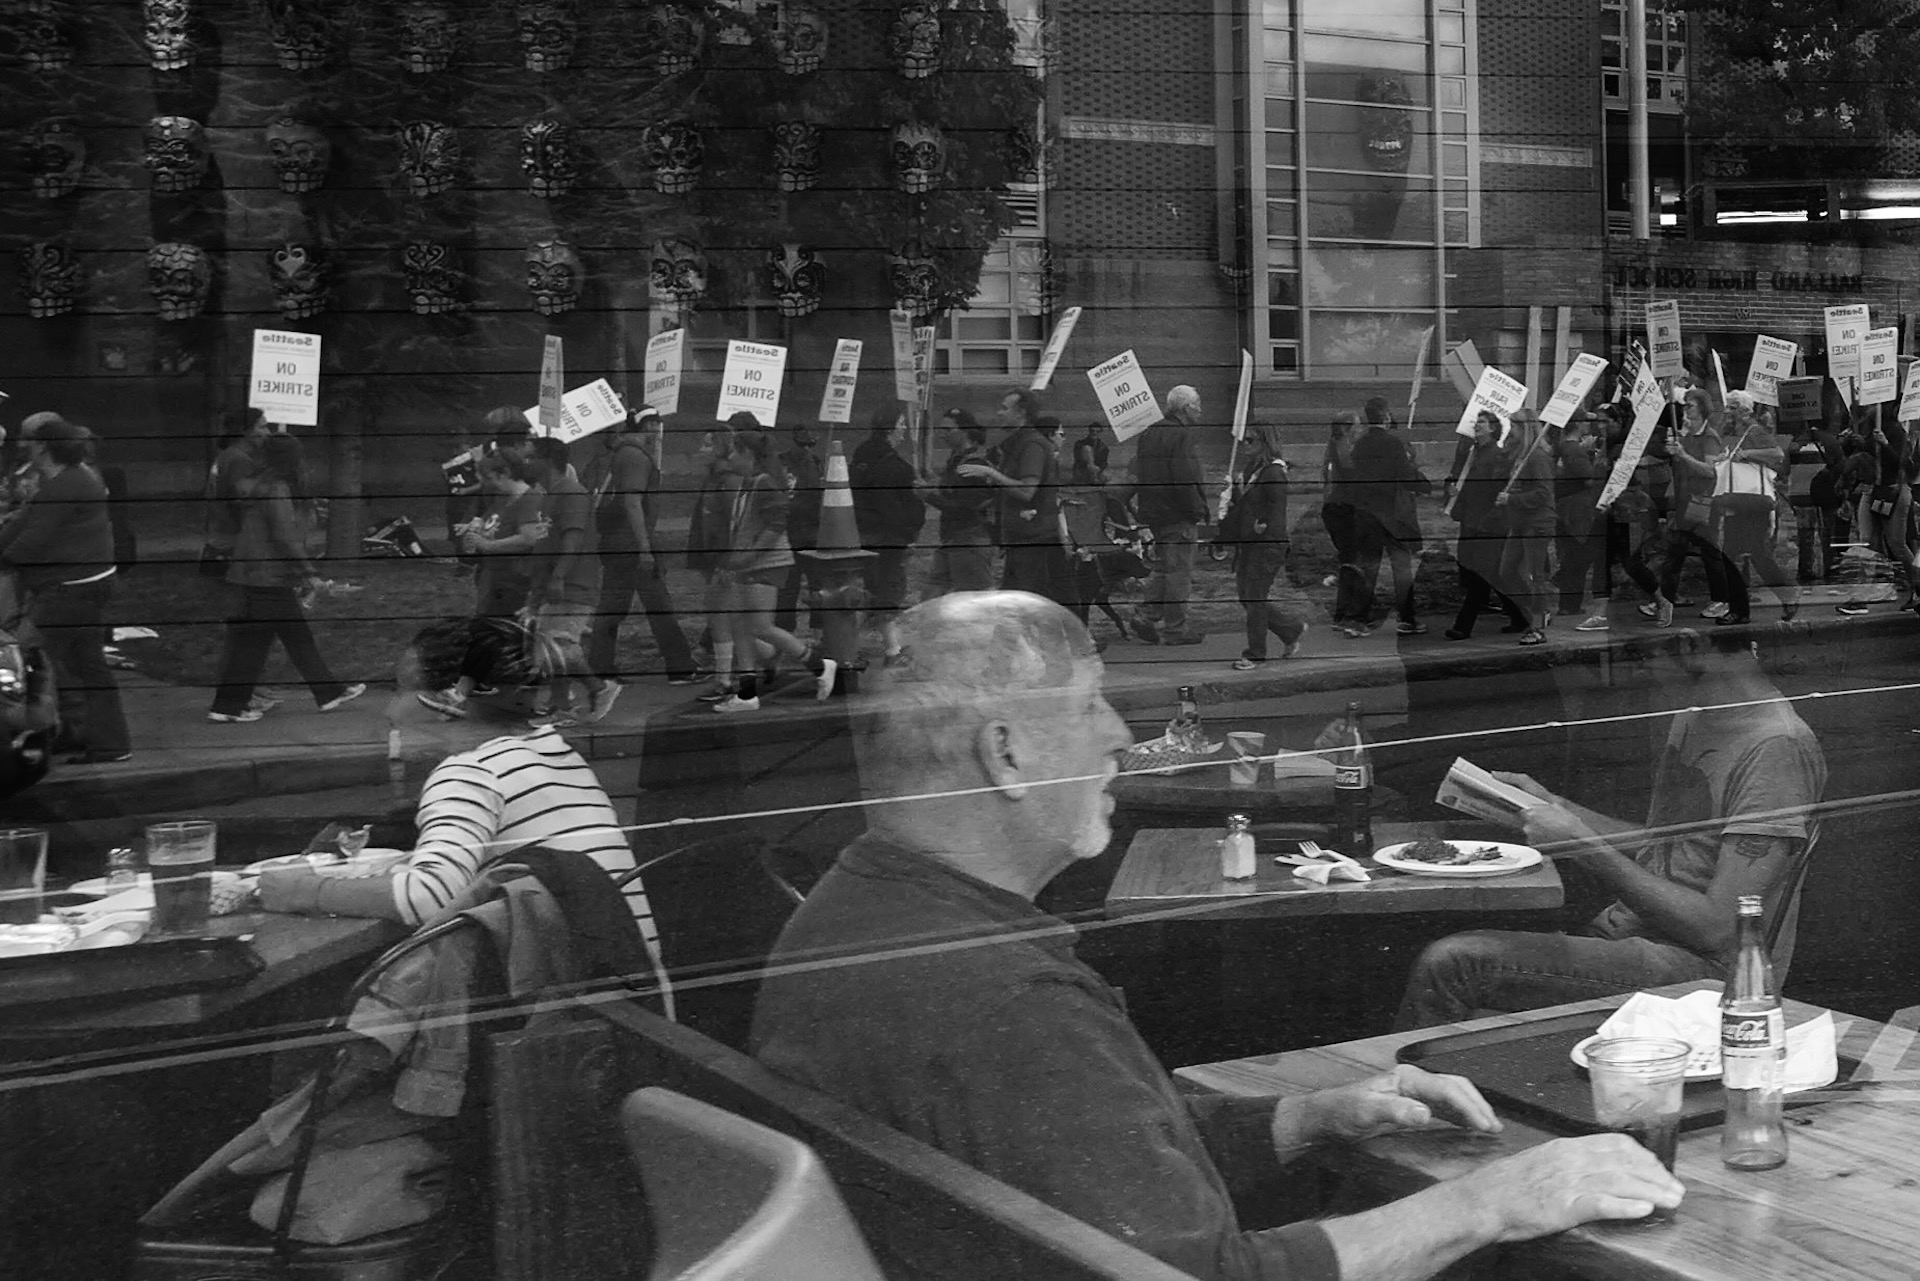 ReflectingOnDaysOfProtest-DoranBastin.jpeg